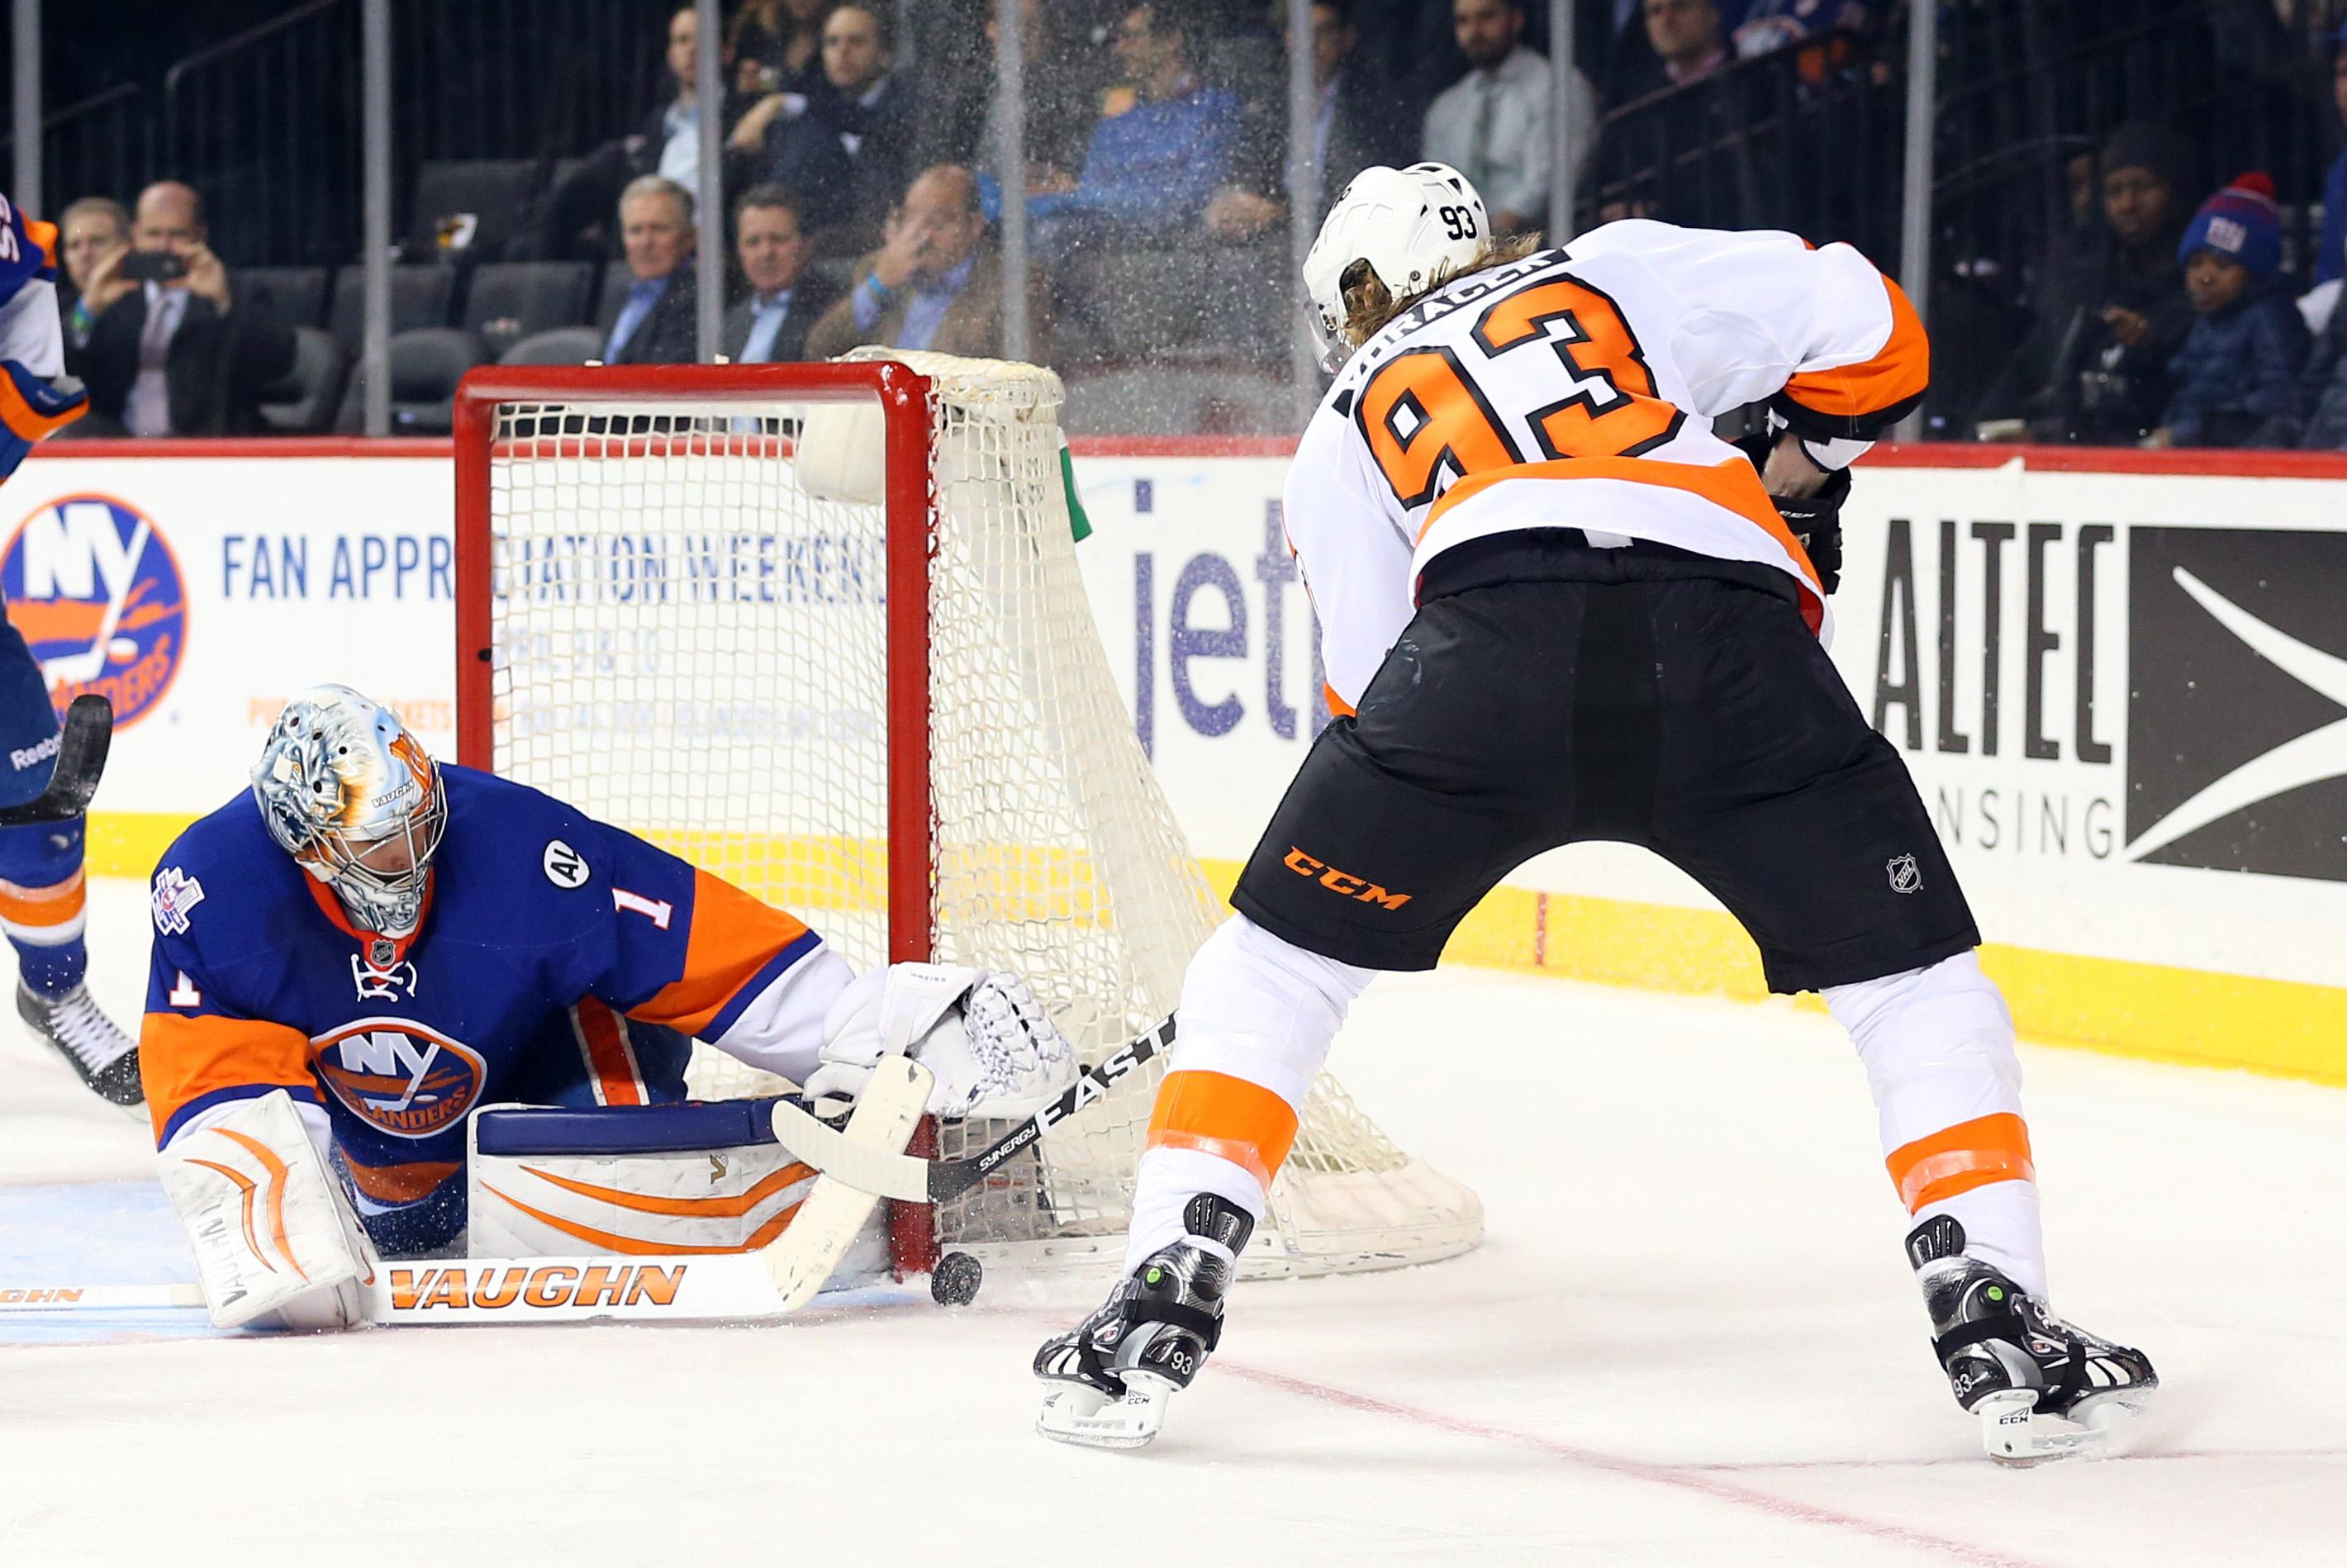 'Al Arbour Rink' To Host New York Islanders Prospect Game